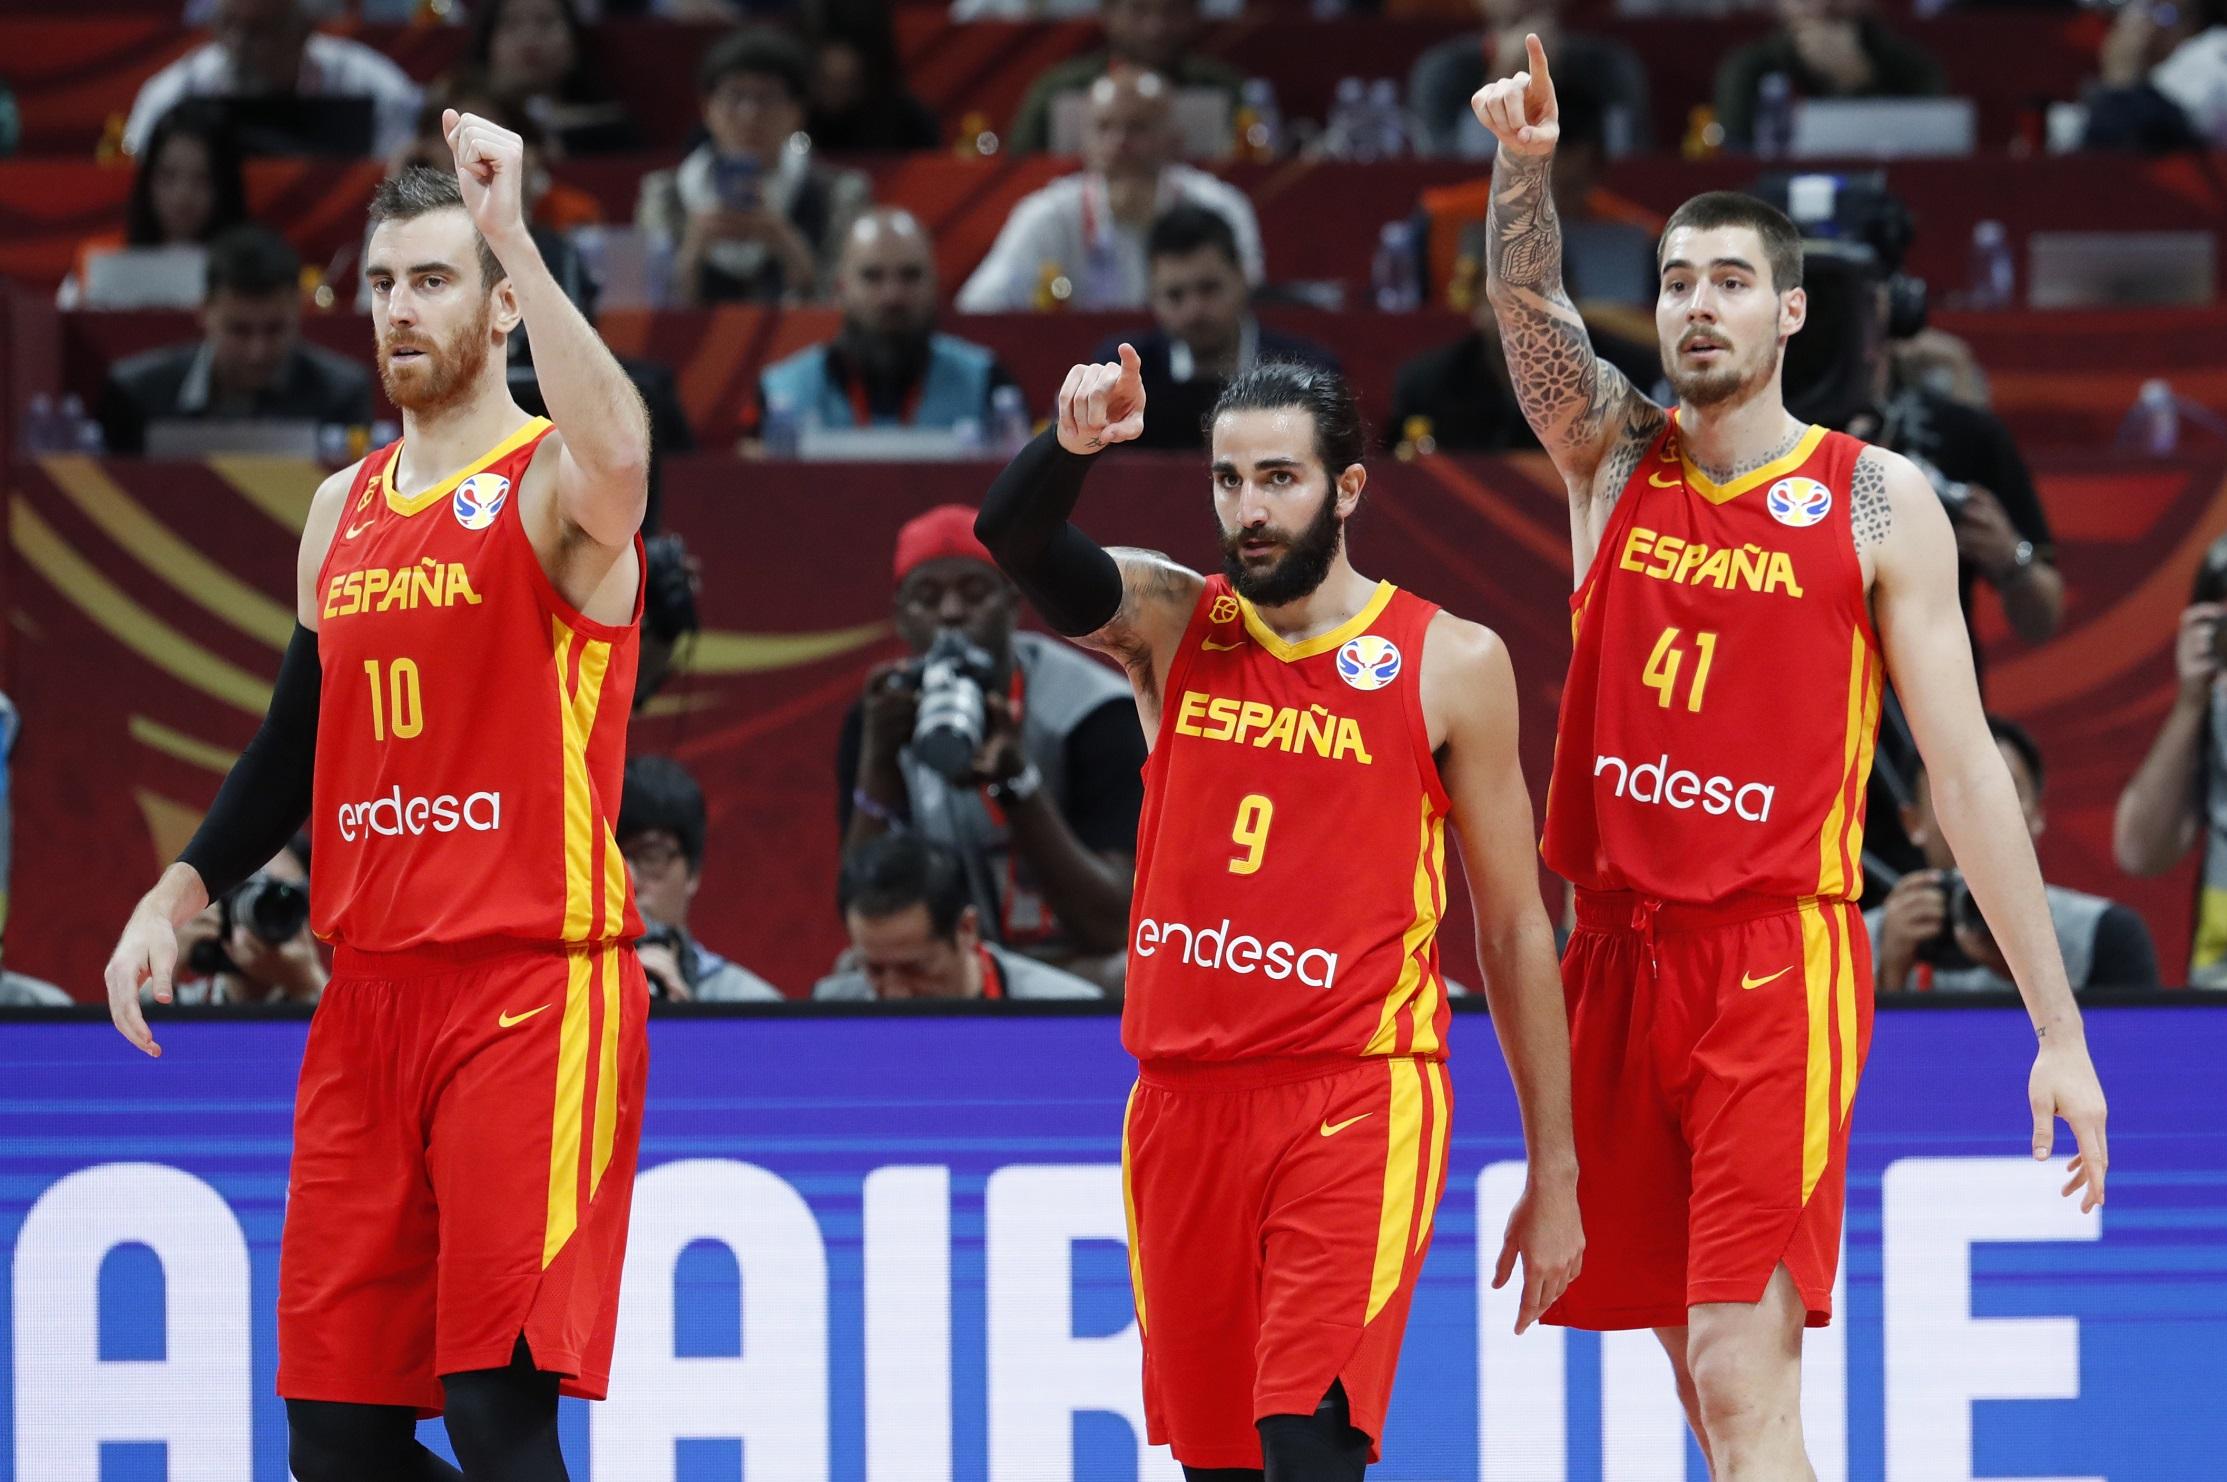 Basketball - FIBA World Cup - Final - Argentina v Spain - Wukesong Sport Arena, Beijing, China - September 15, 2019   Spain's Victor Claver, Ricky Rubio and Juancho Hernangomez REUTERS/Kim Kyung-Hoon